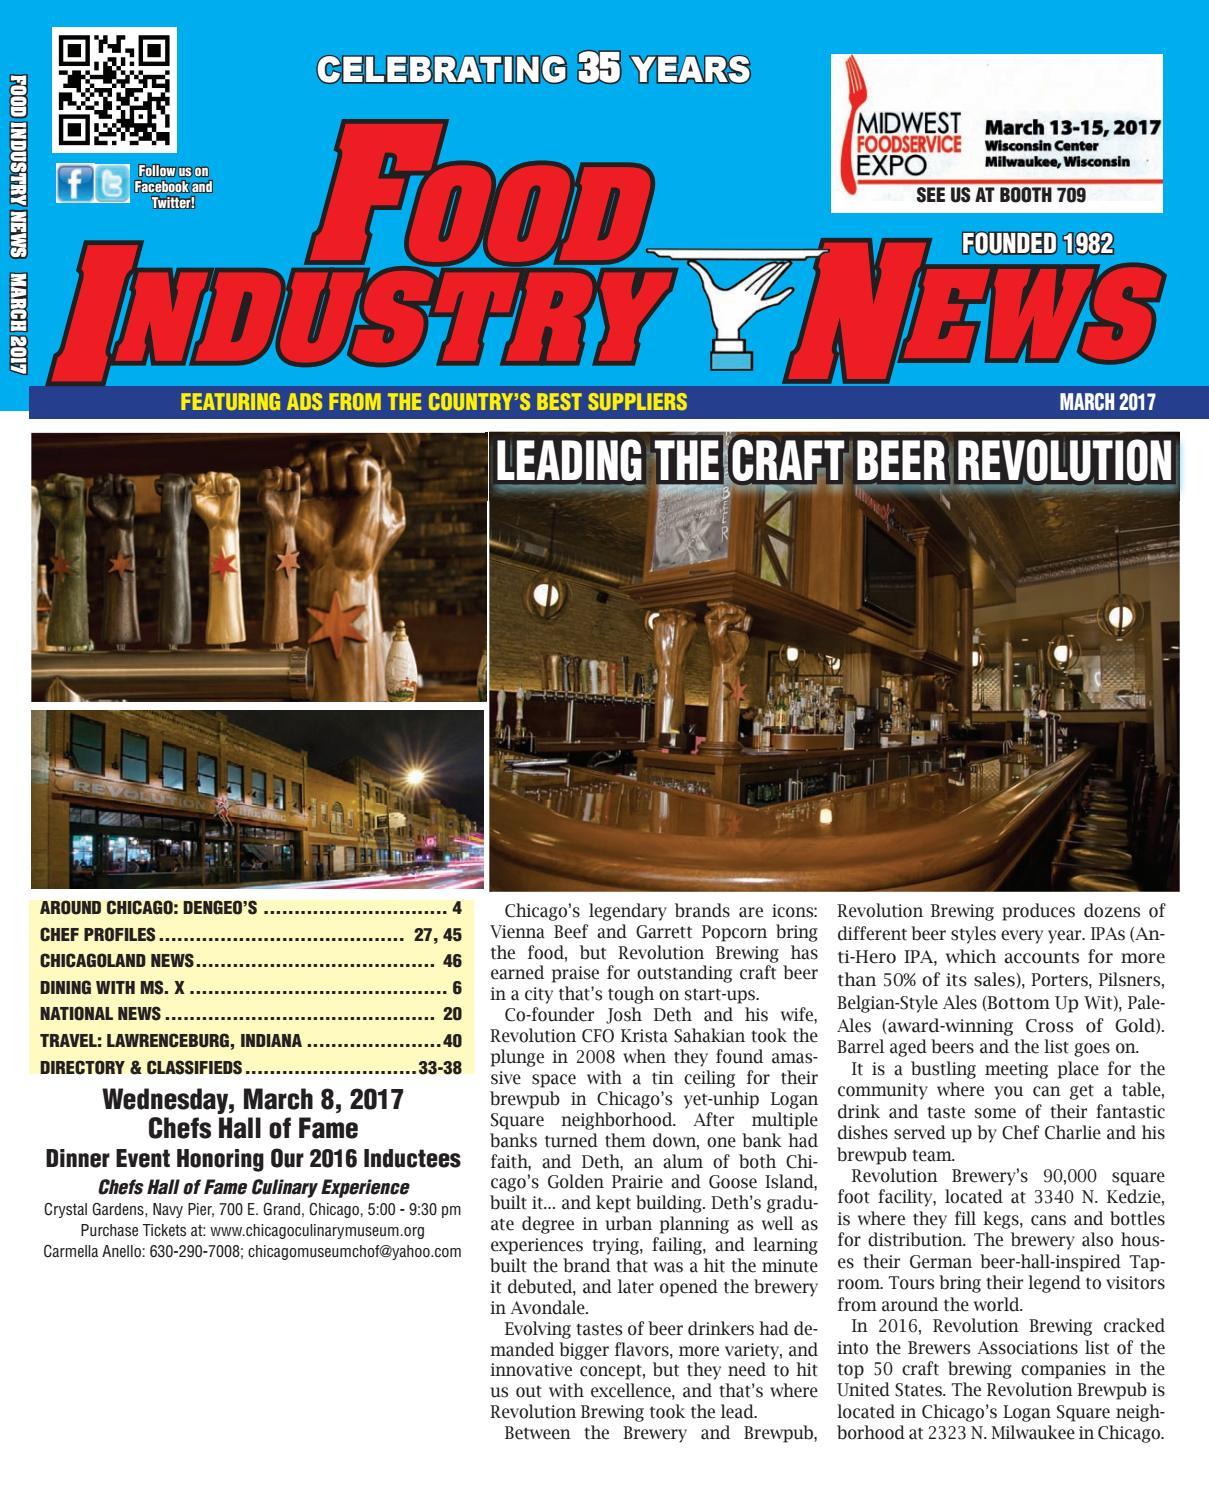 Food Industry News March 2017 web by FoodIndustryNews - issuu